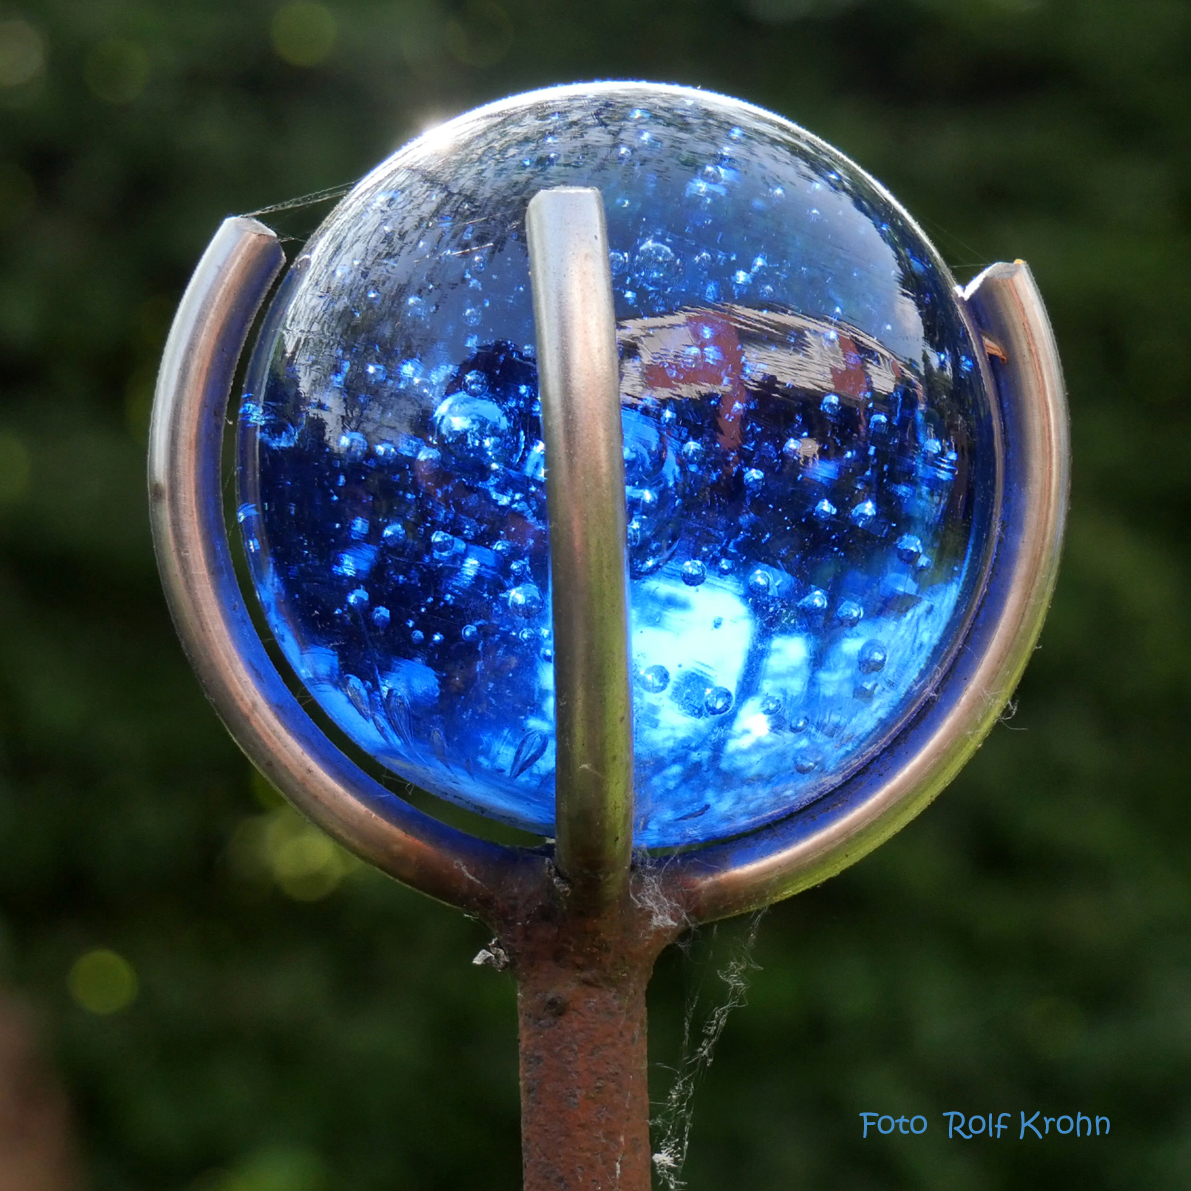 gefangene Glaskugel